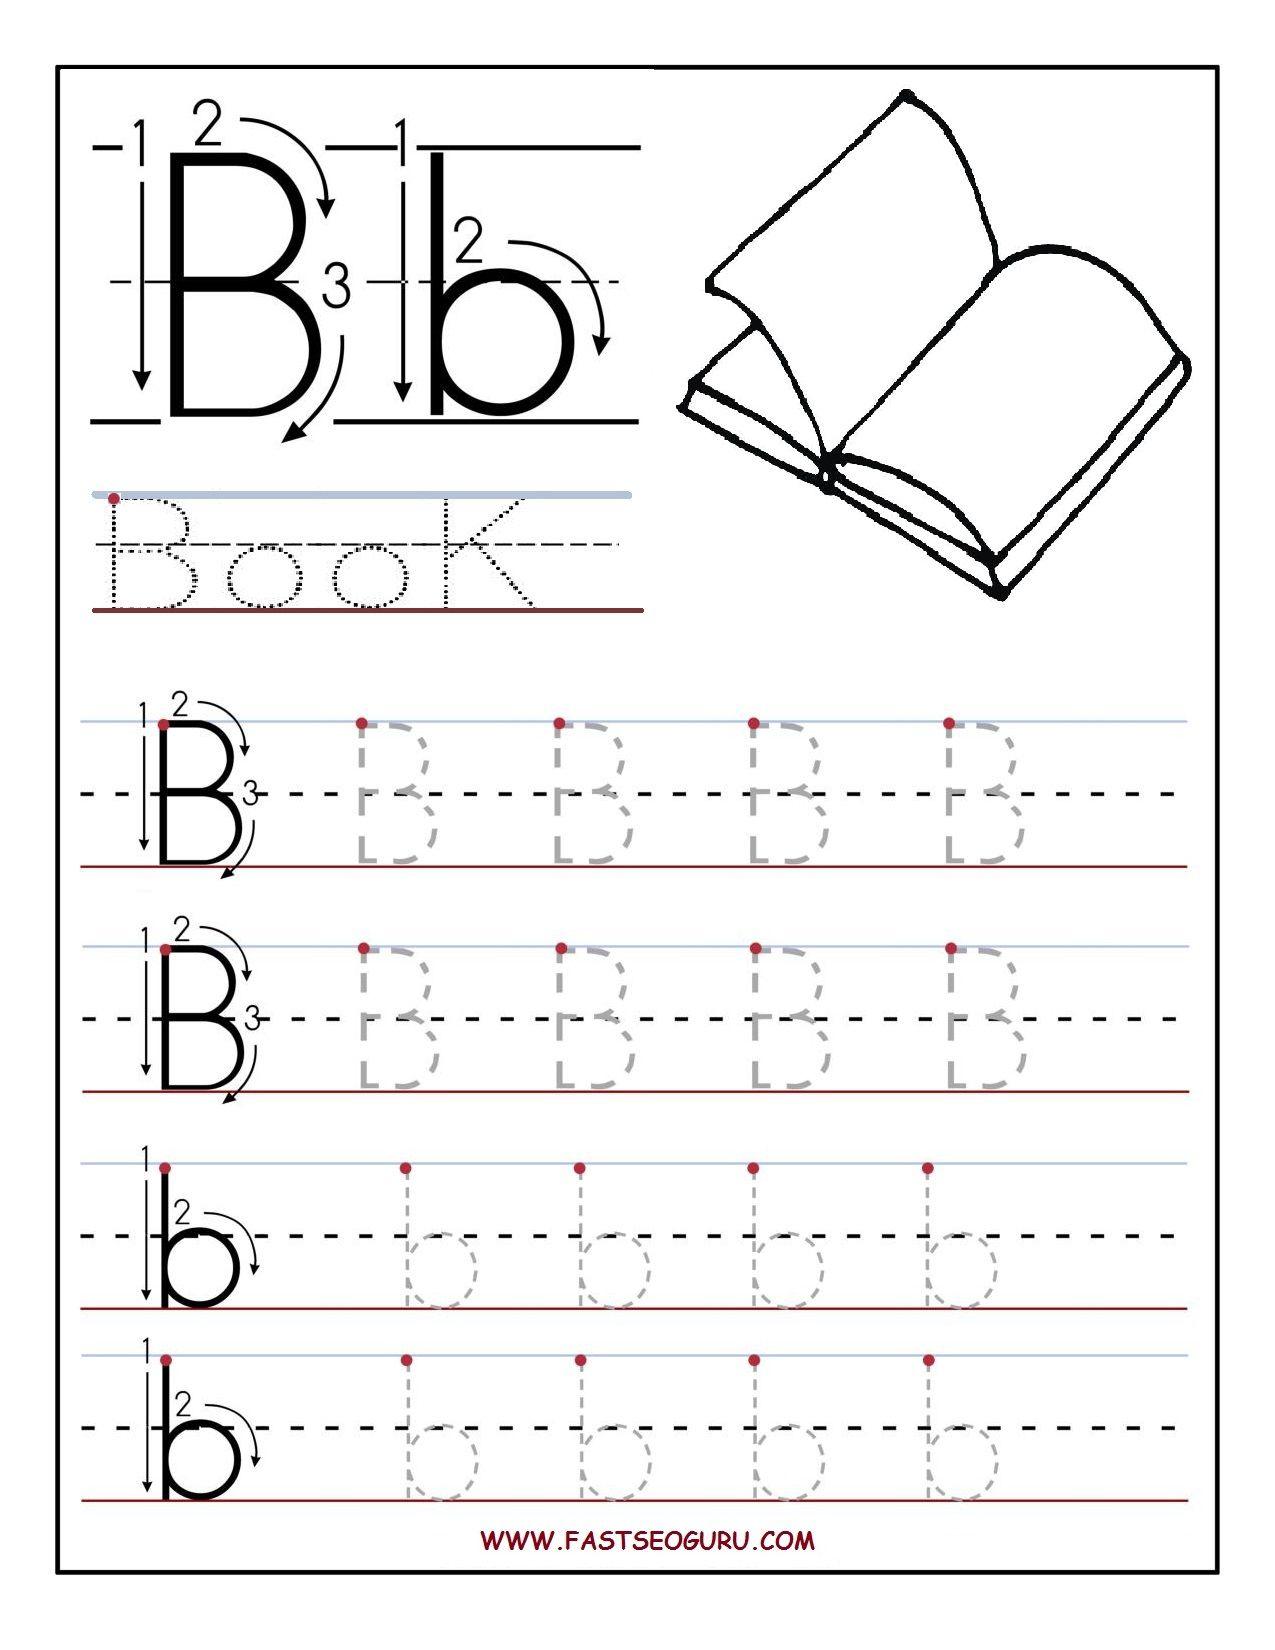 Letter B Worksheets For Preschoolers | Printable Letter B Tracing - Letter B Puzzle Printable